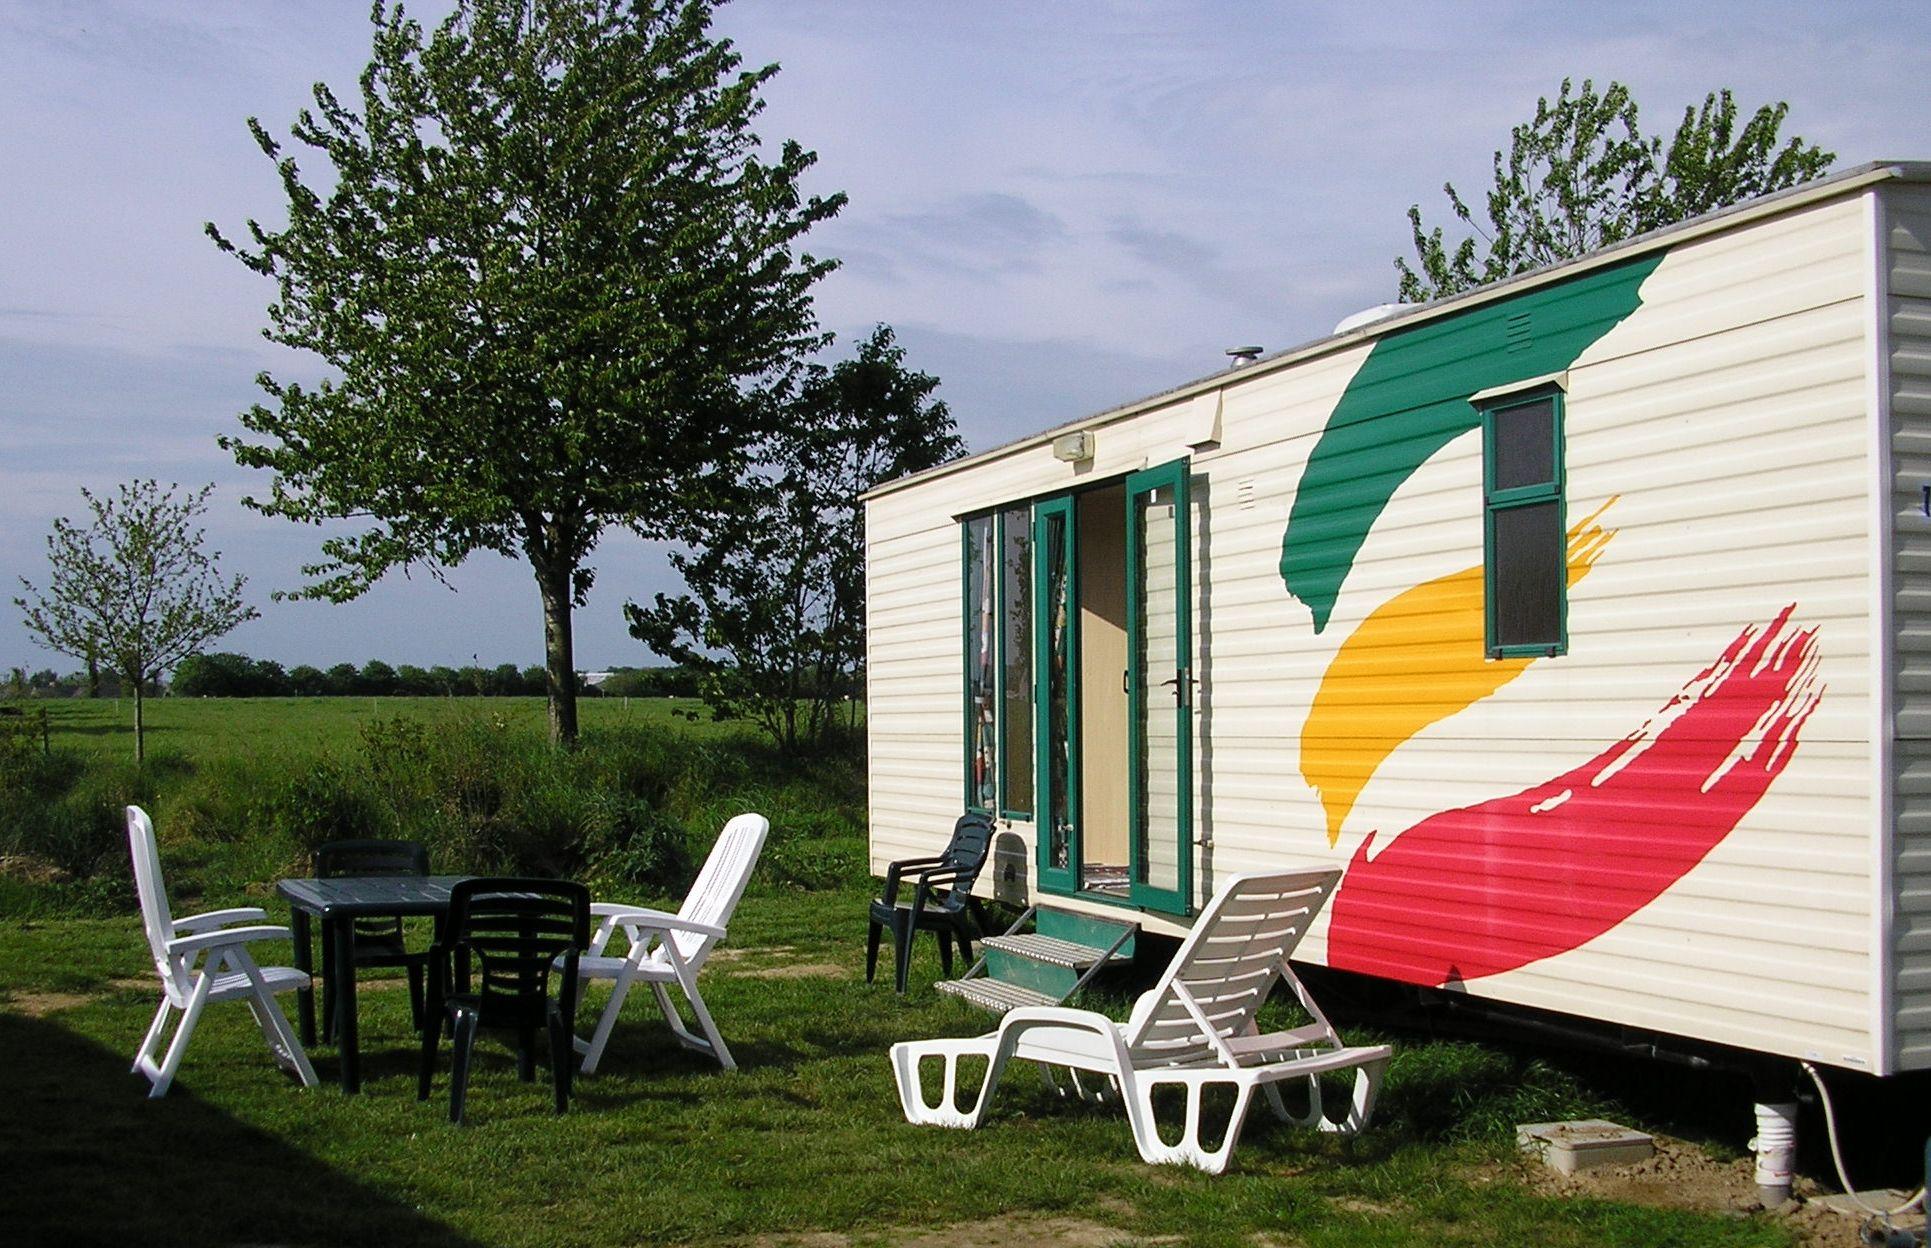 domaine naturiste pallieter in bourseul frankreich. Black Bedroom Furniture Sets. Home Design Ideas